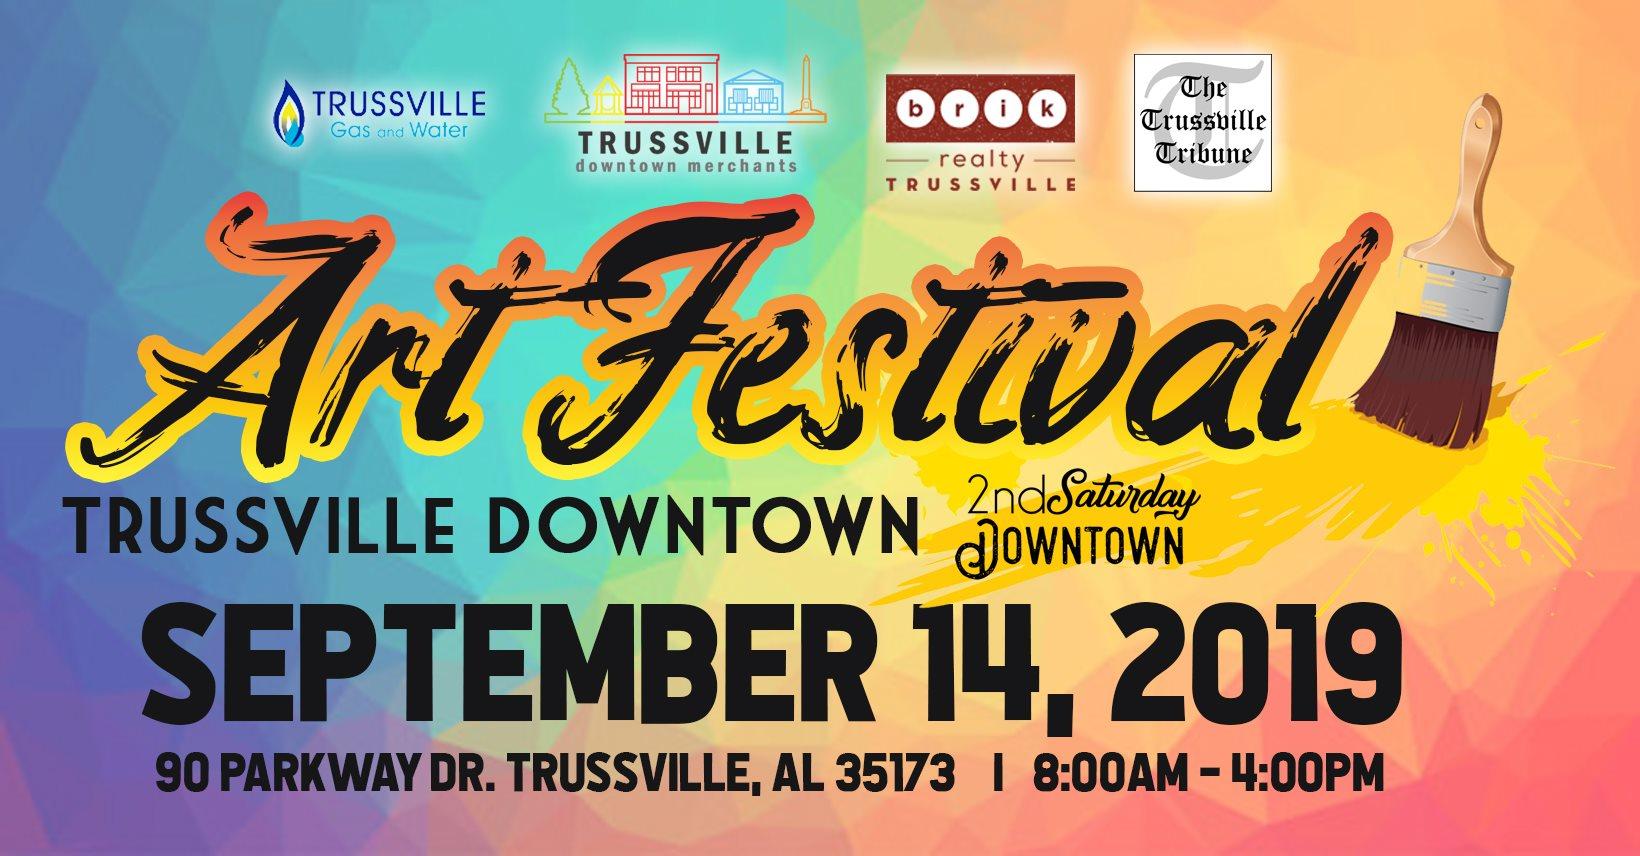 2nd Saturday Downtown Trussville: Art Festival